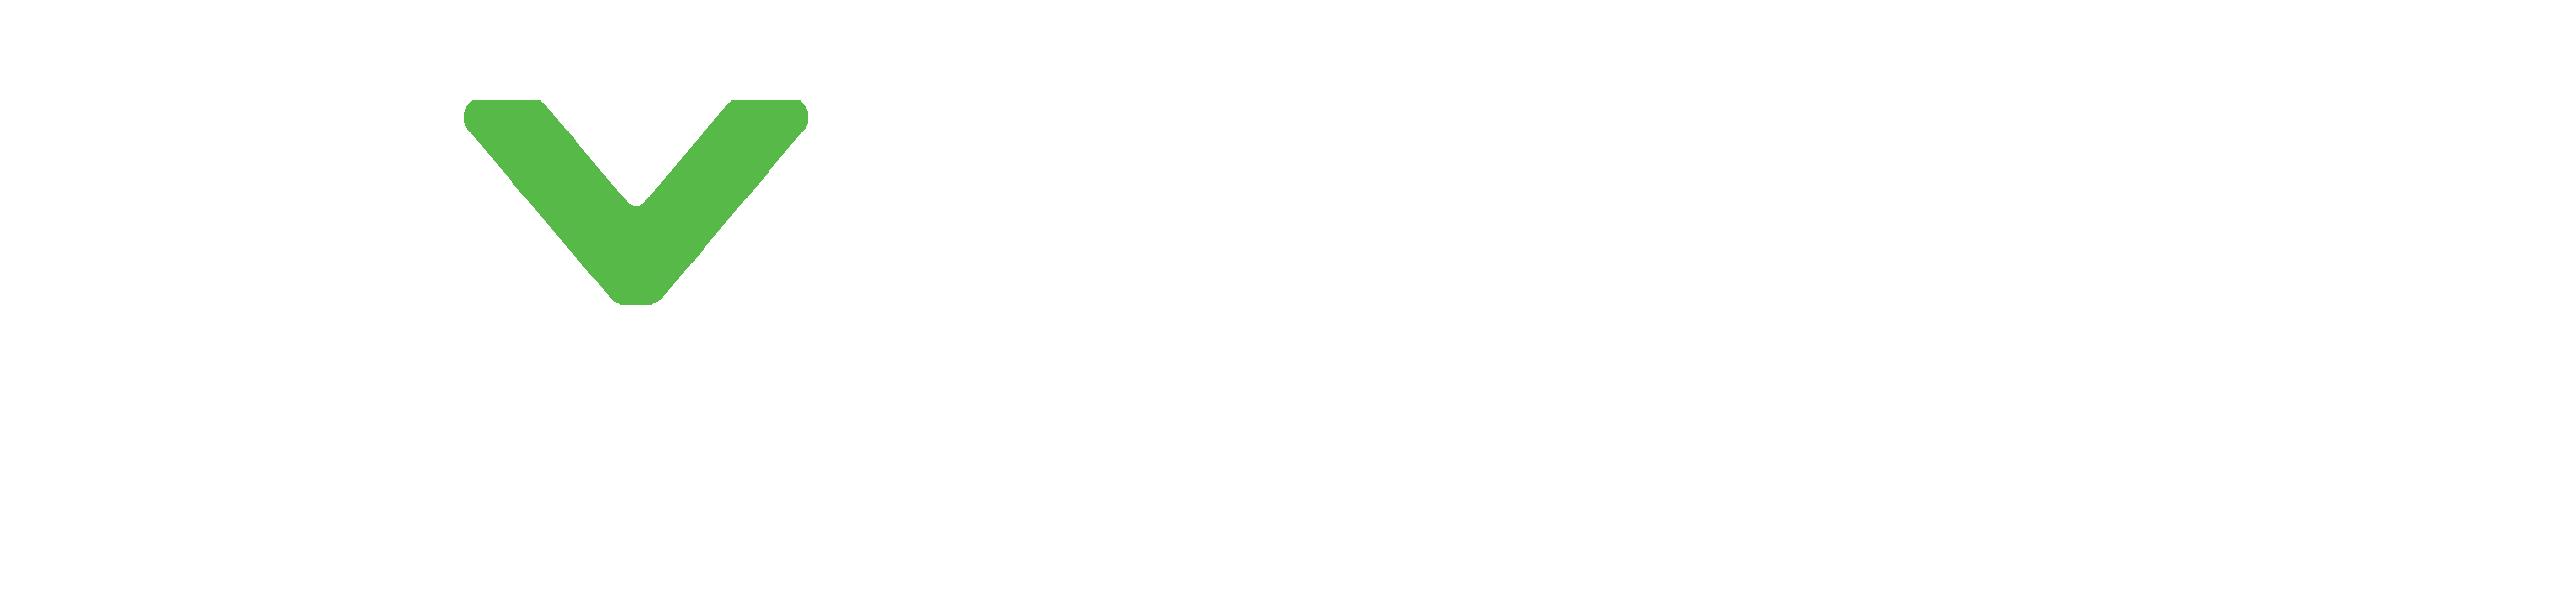 Vaporizer Wizard Menu Banner Logo